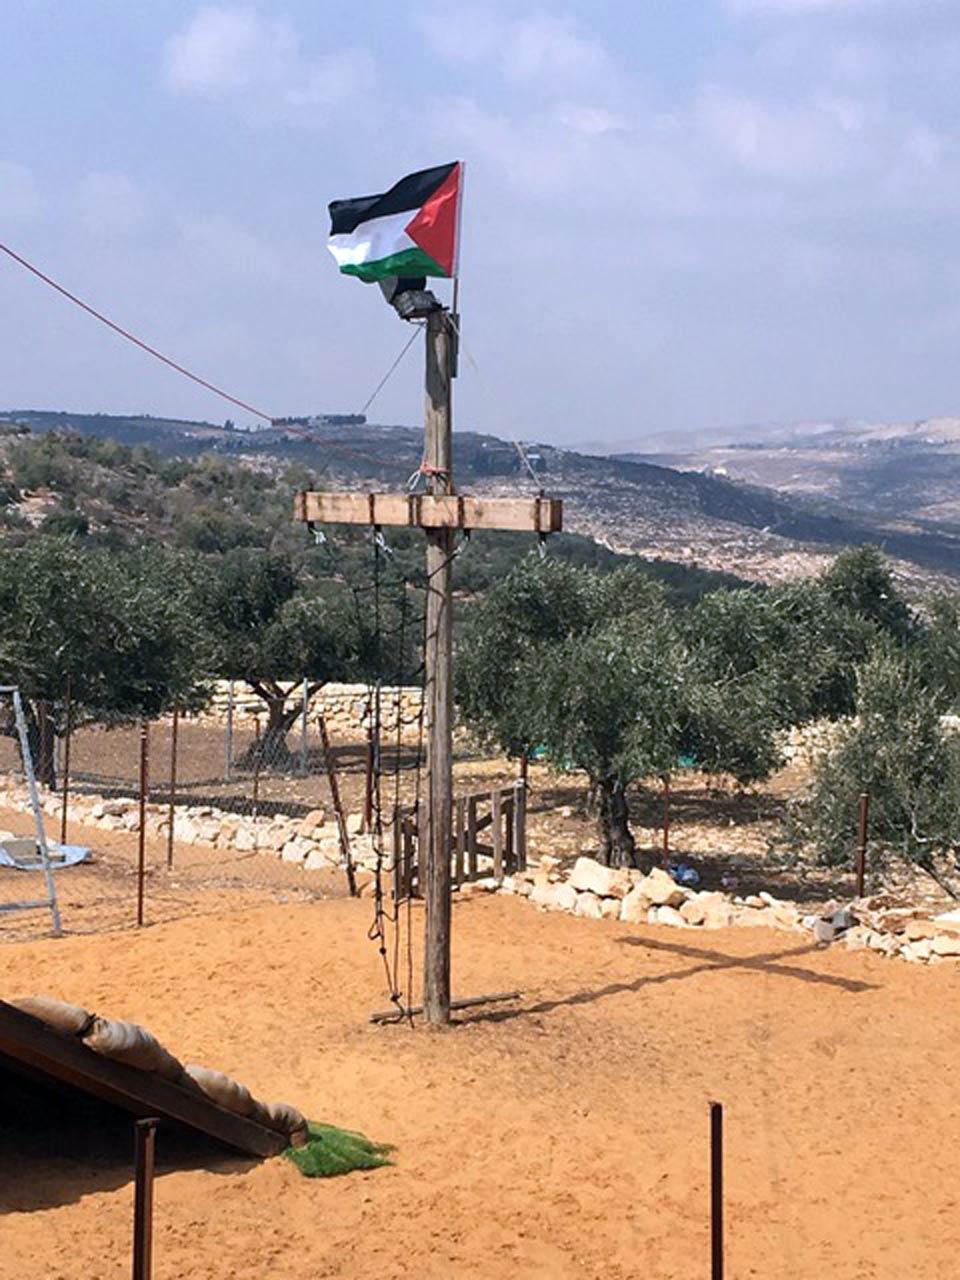 Olive Harvest Festival, playground at Daily Hugz, Asira al-Shimaliyah, Palestine.